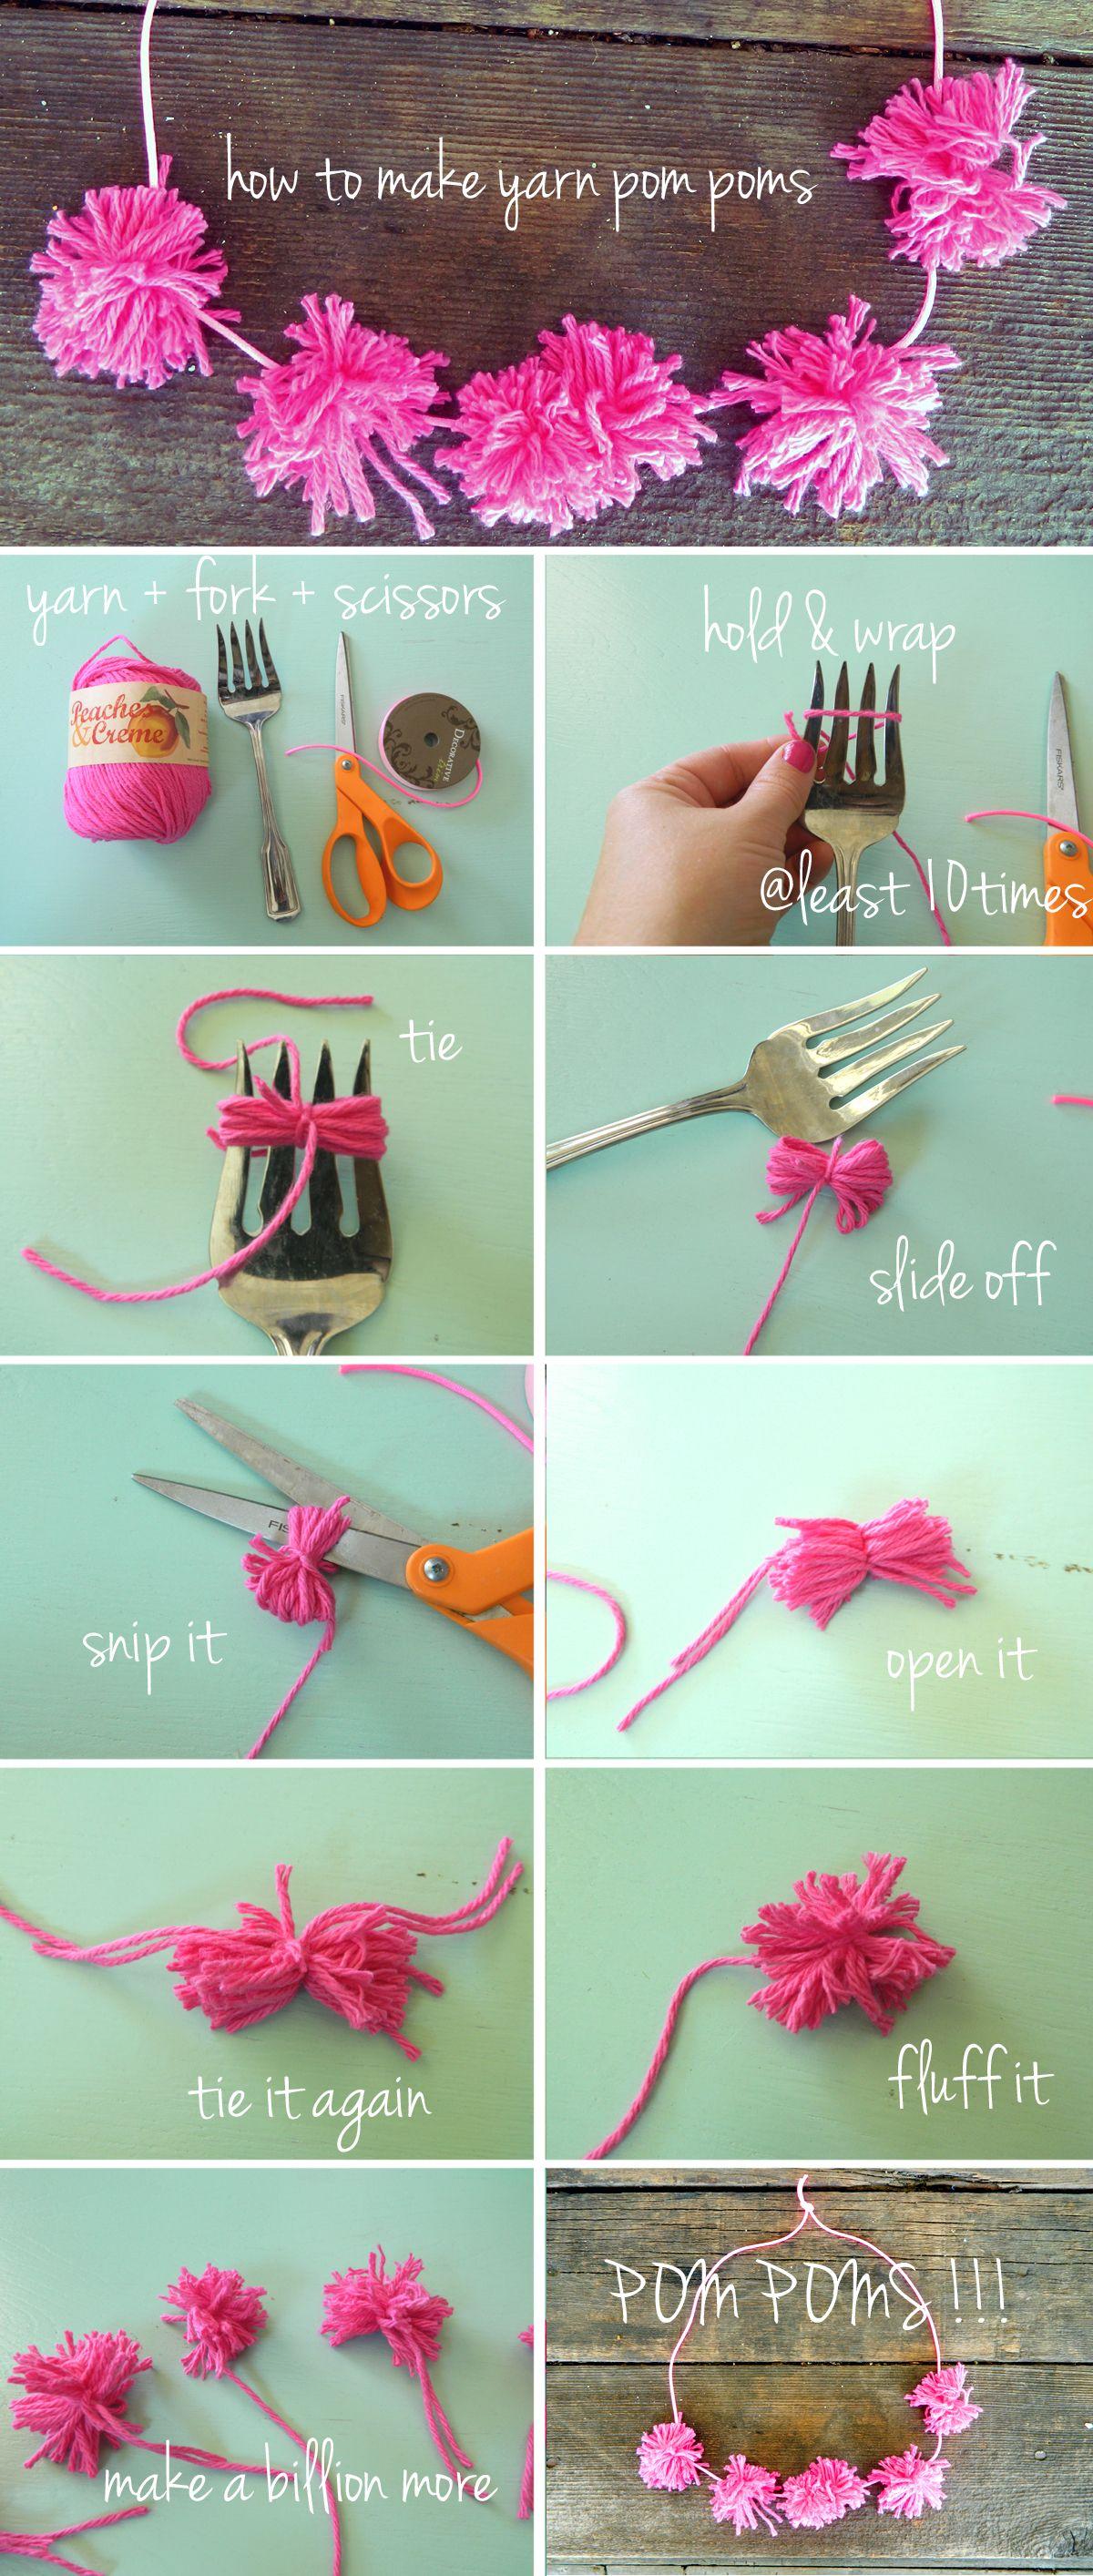 Diy Pom Poms Party Diy Craft Crafts Craft Ideas Instructions Easy